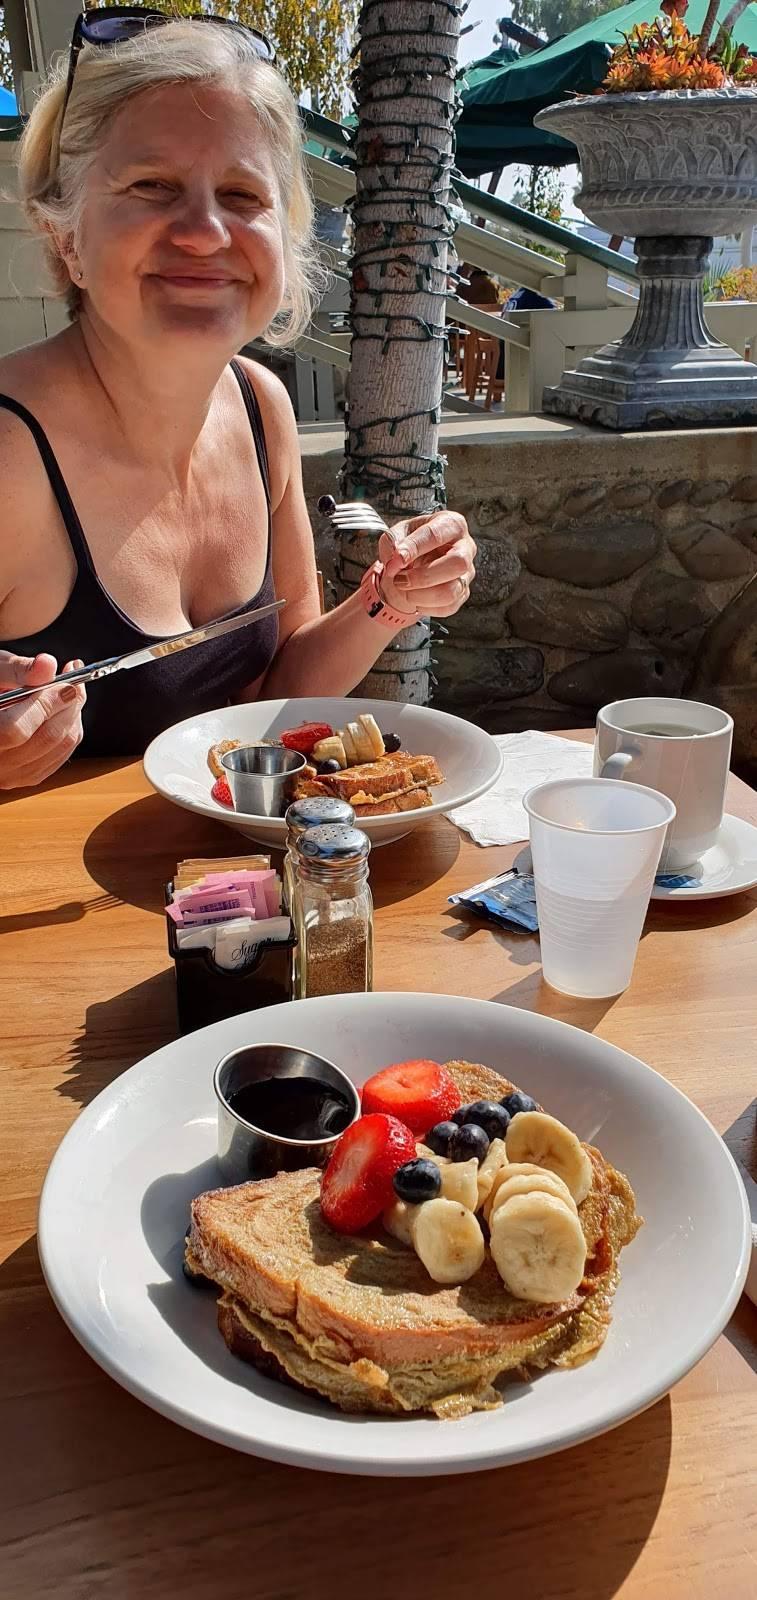 number three restaurant - restaurant  | Photo 2 of 7 | Address: 320 N Coast Hwy, Laguna Beach, CA 92651, USA | Phone: (949) 549-4817